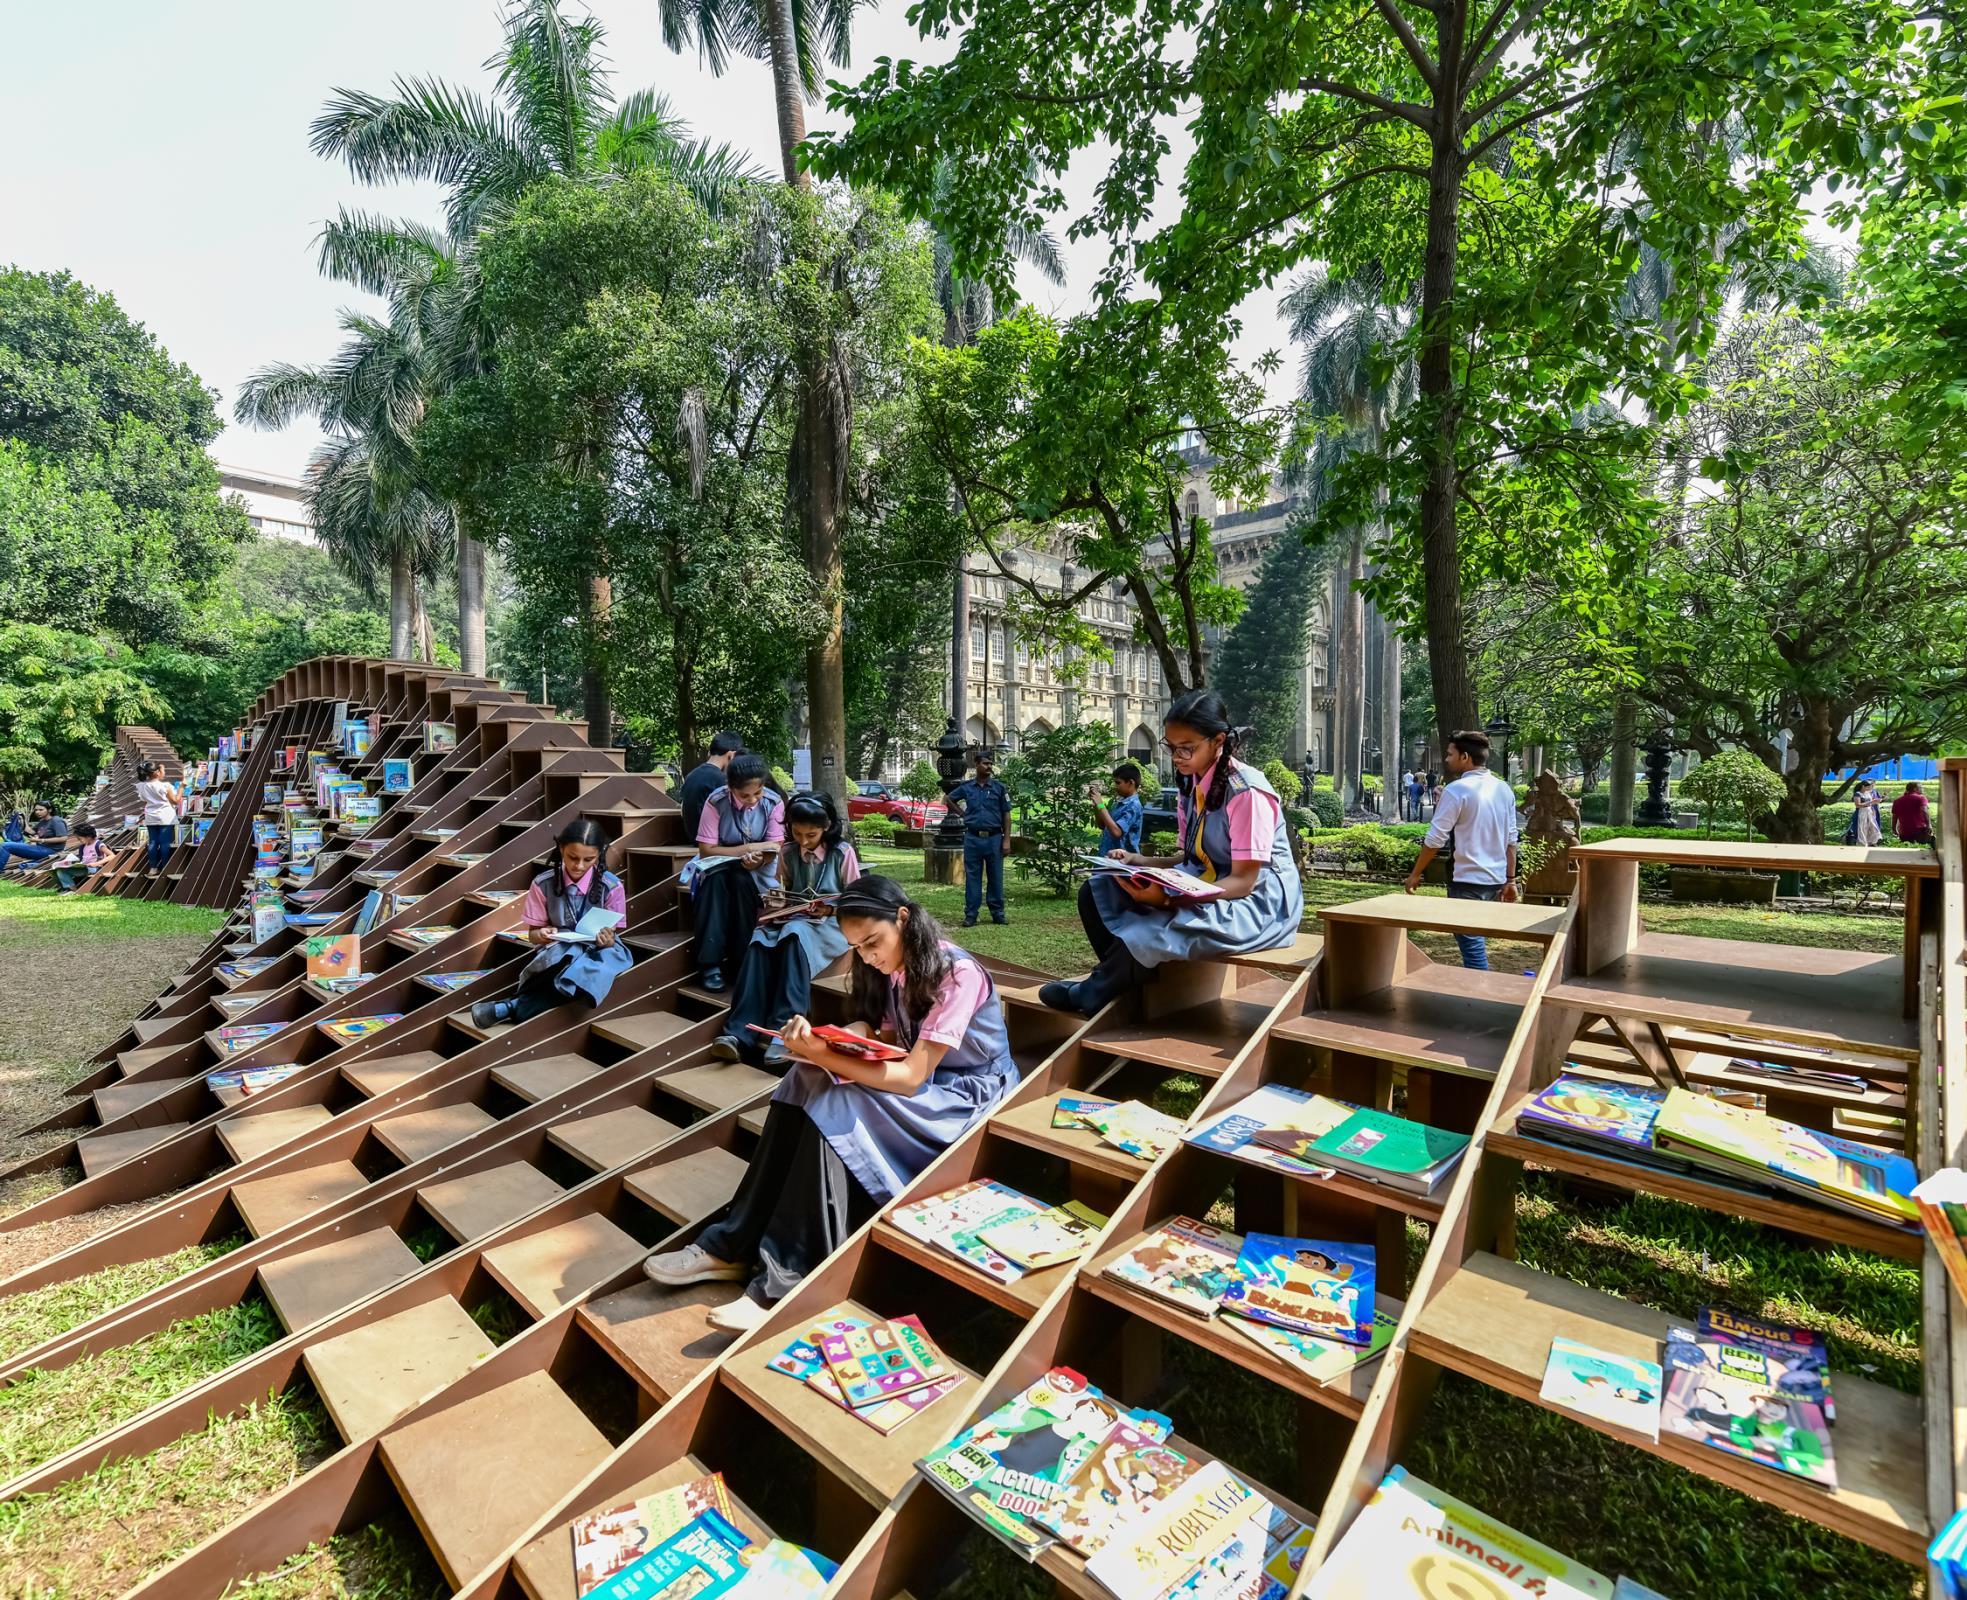 BookWorm Pavilion ห้องสมุดตัวหนอน เดินทางทั่วอินเดียเพื่อส่งเสริมการอ่าน